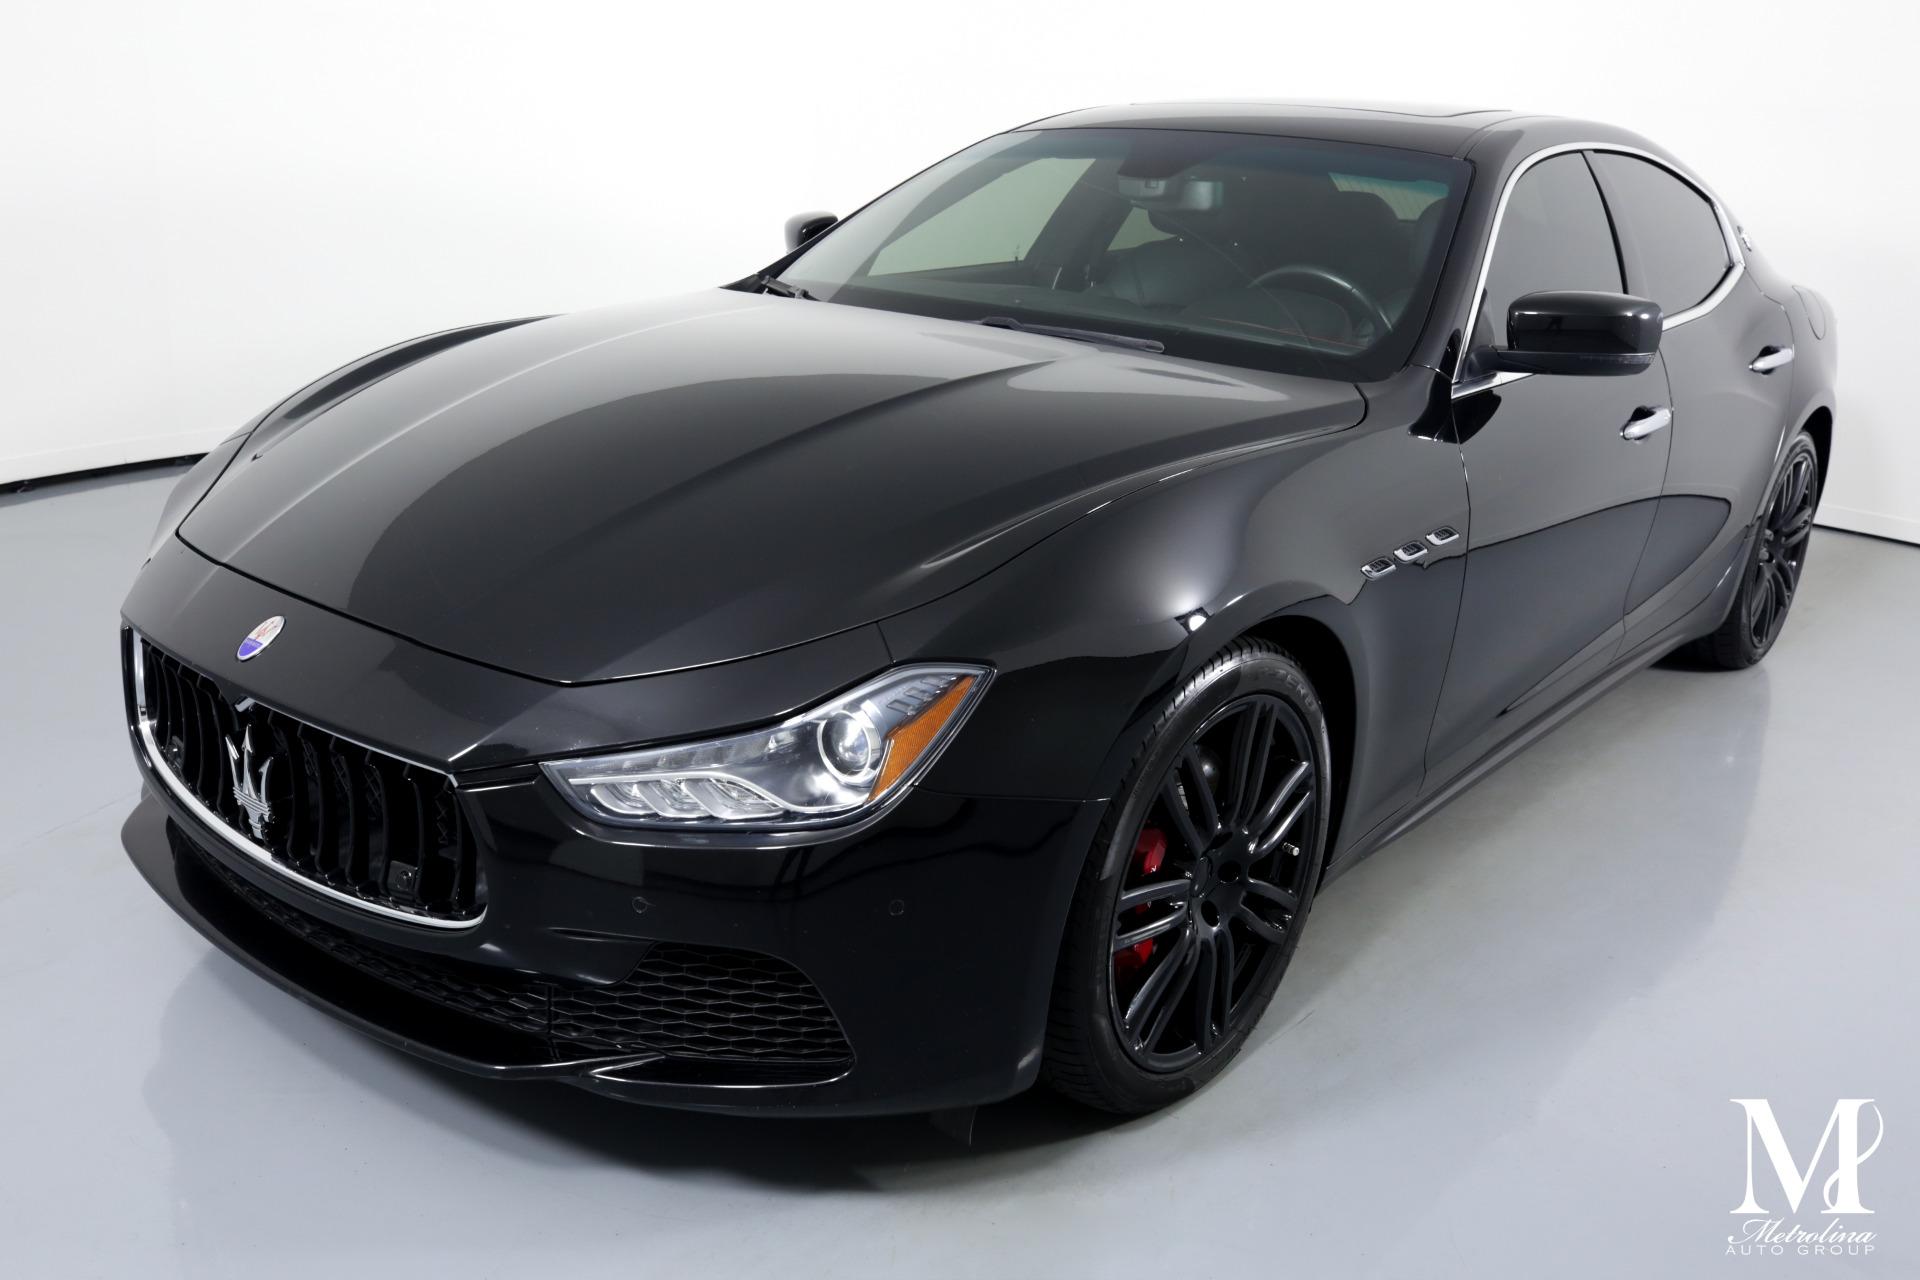 Used 2015 Maserati Ghibli S Q4 for sale $29,996 at Metrolina Auto Group in Charlotte NC 28217 - 4